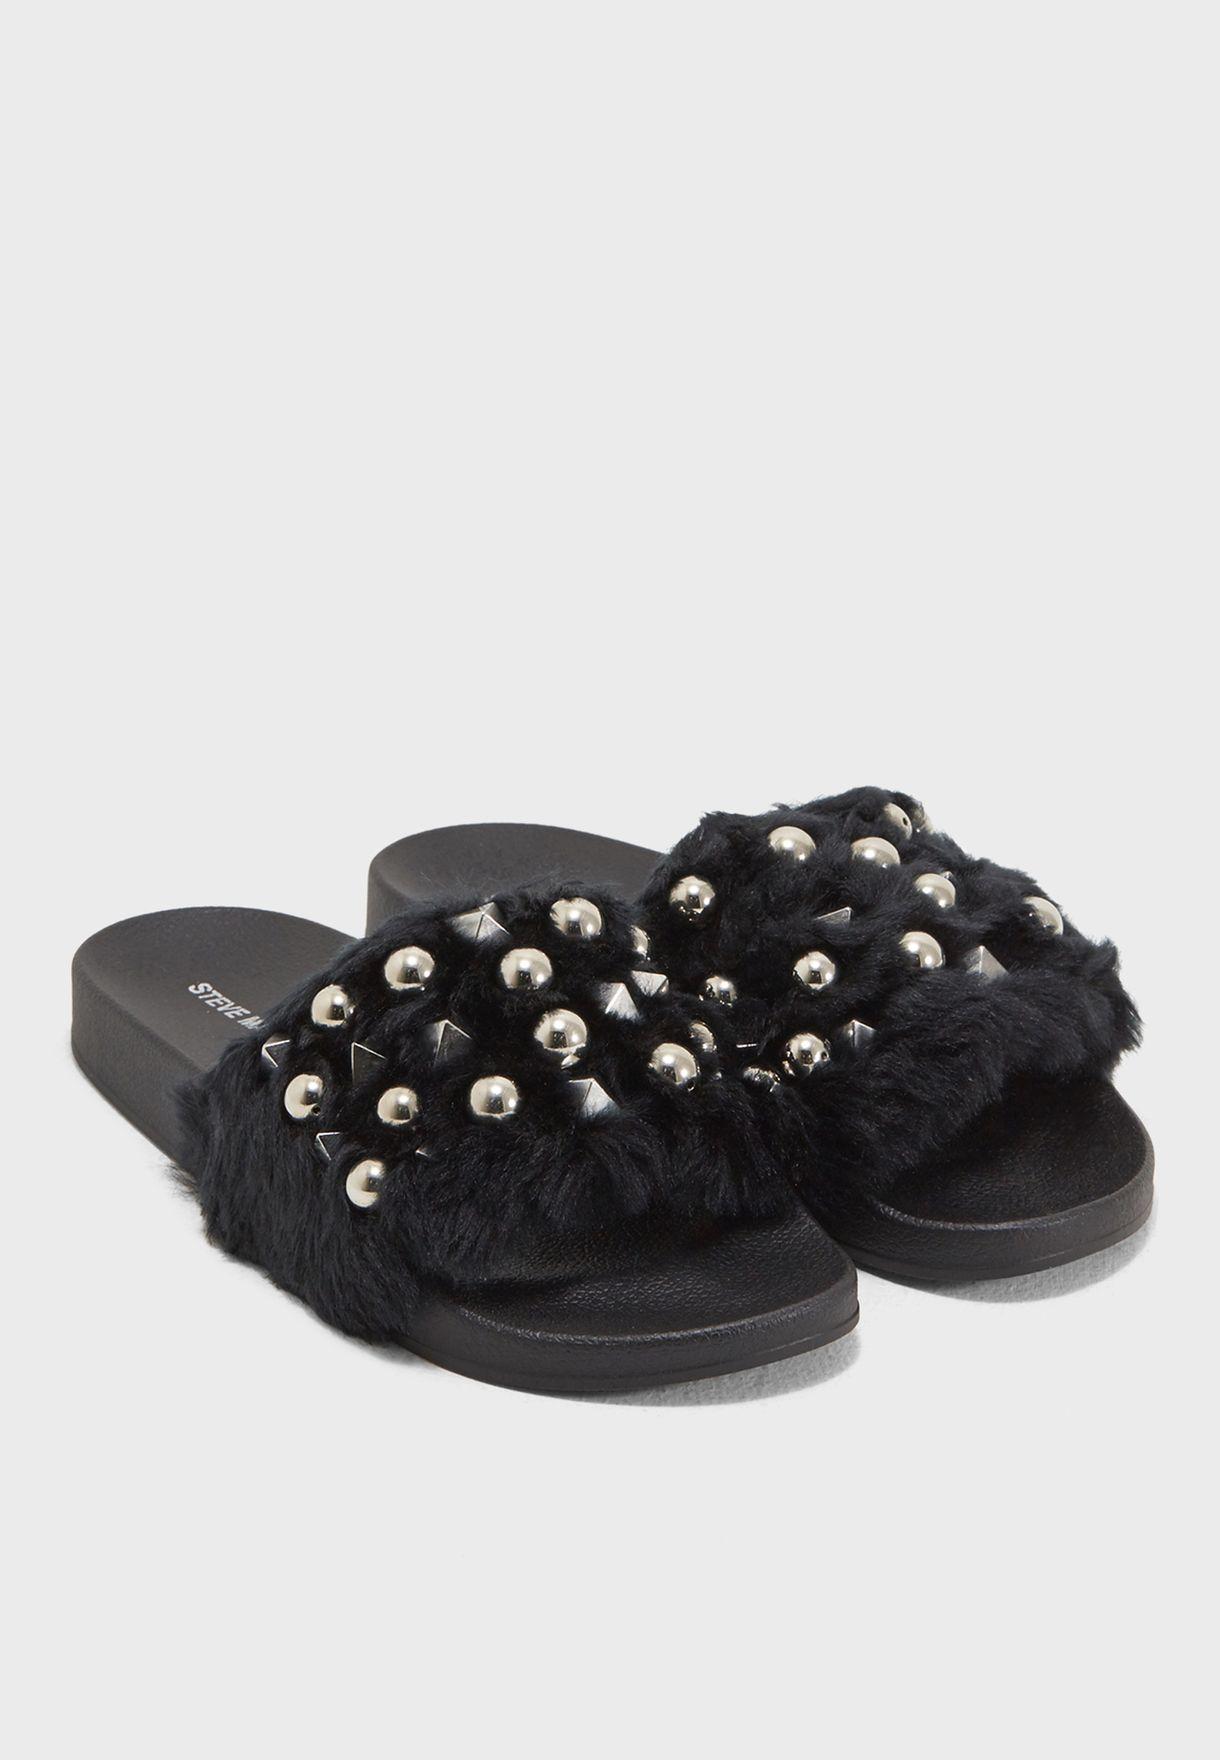 fc7305e22a6 Shop Steve Madden black Yeah Flat Sandals YEAH for Women in UAE ...